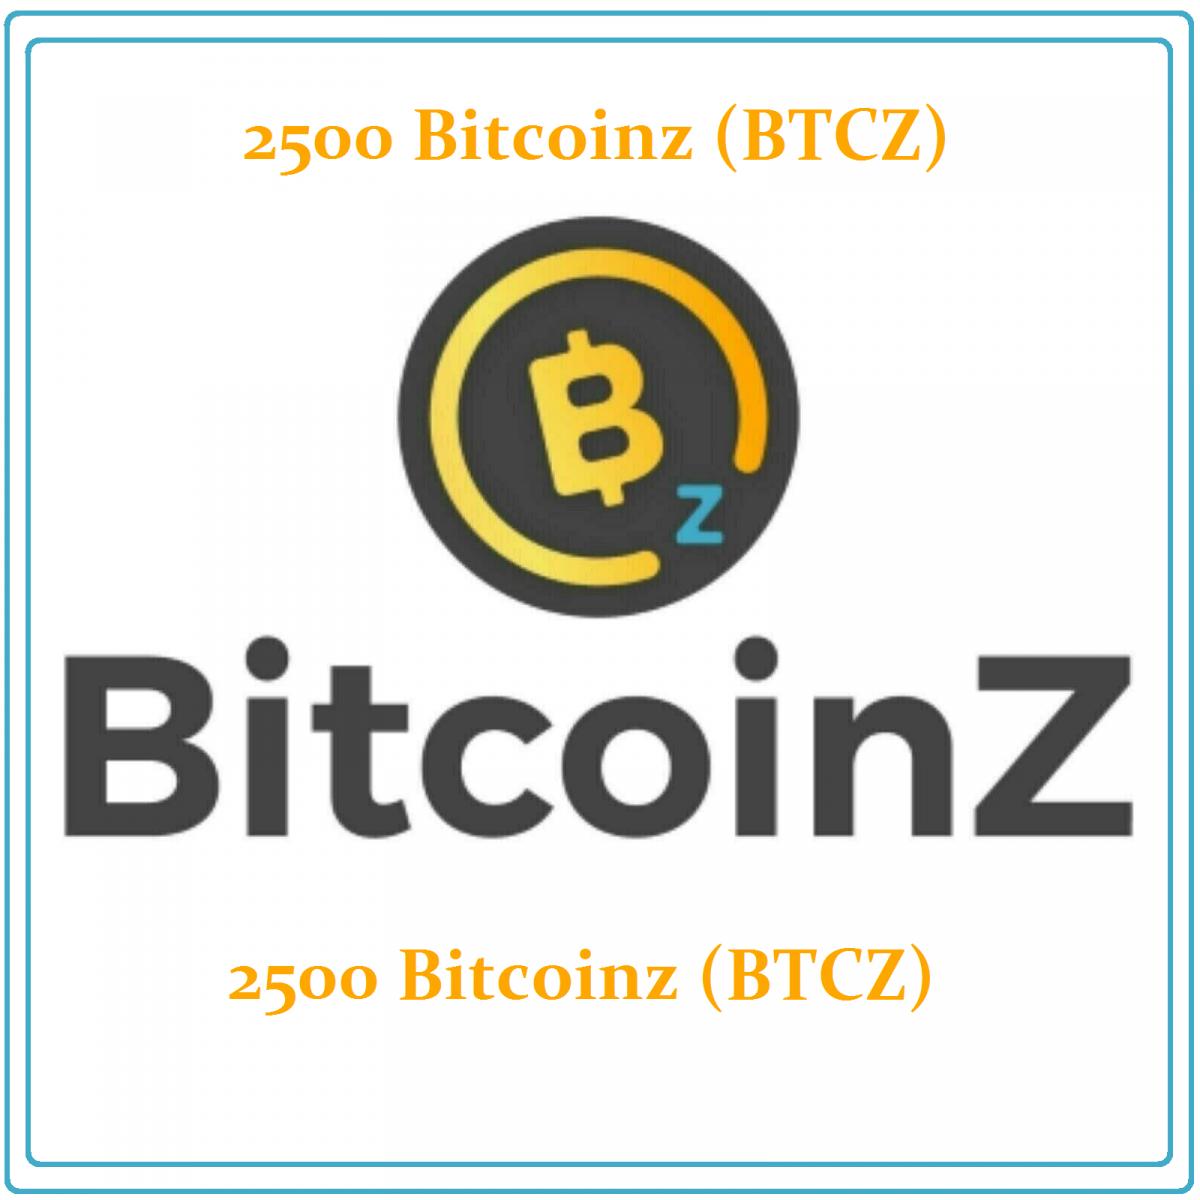 2500 BitcoinZ (BTCZ) Mining Contract